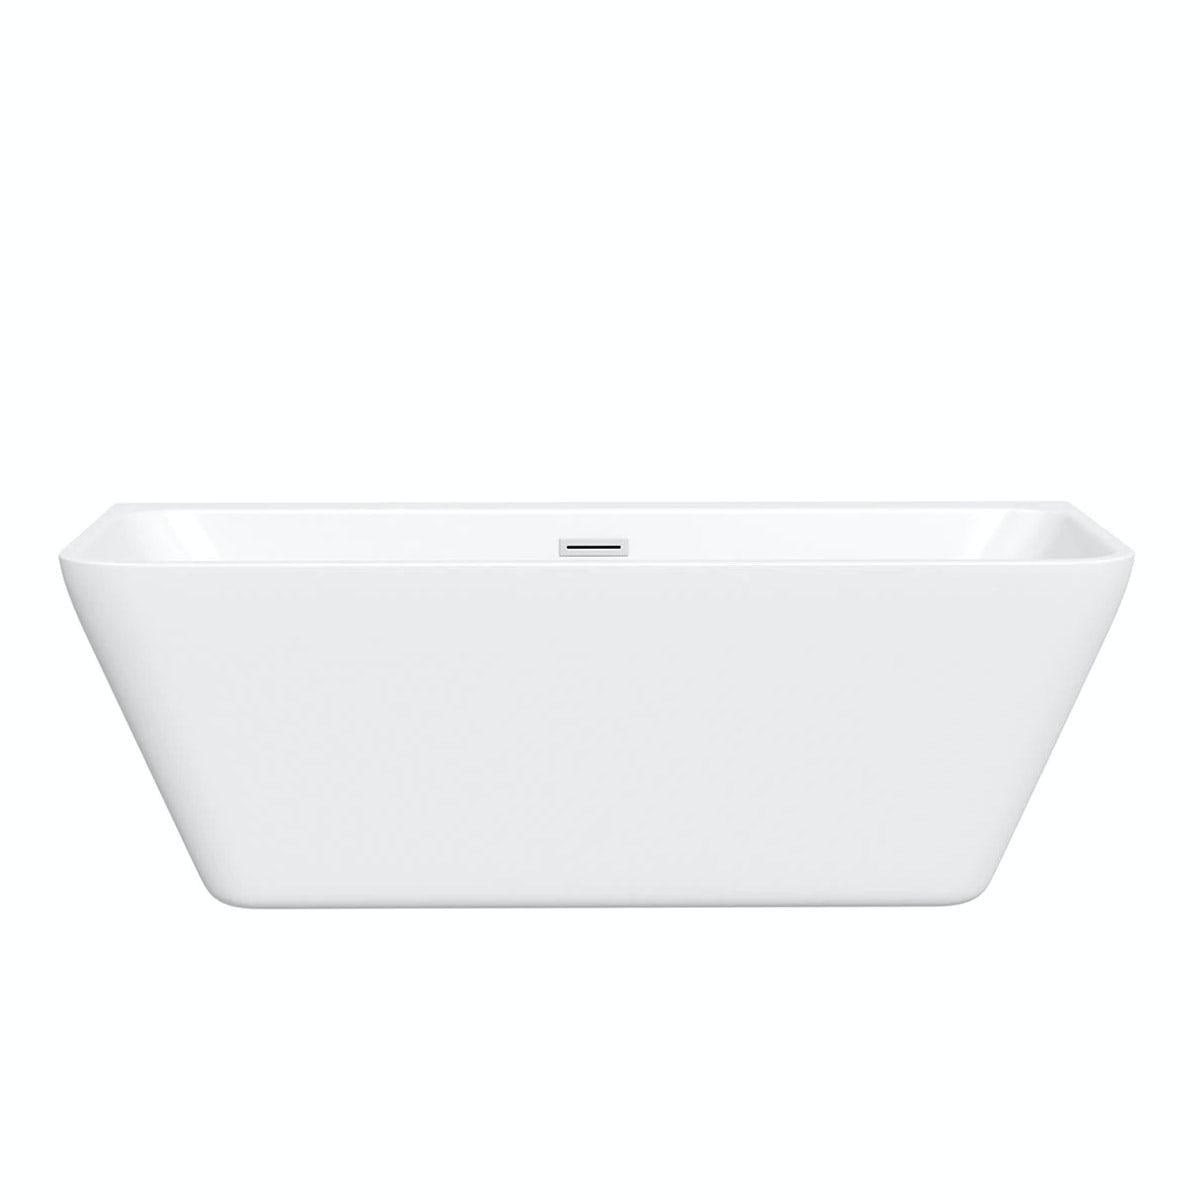 Mode Carter back to wall bath 1700 x 750